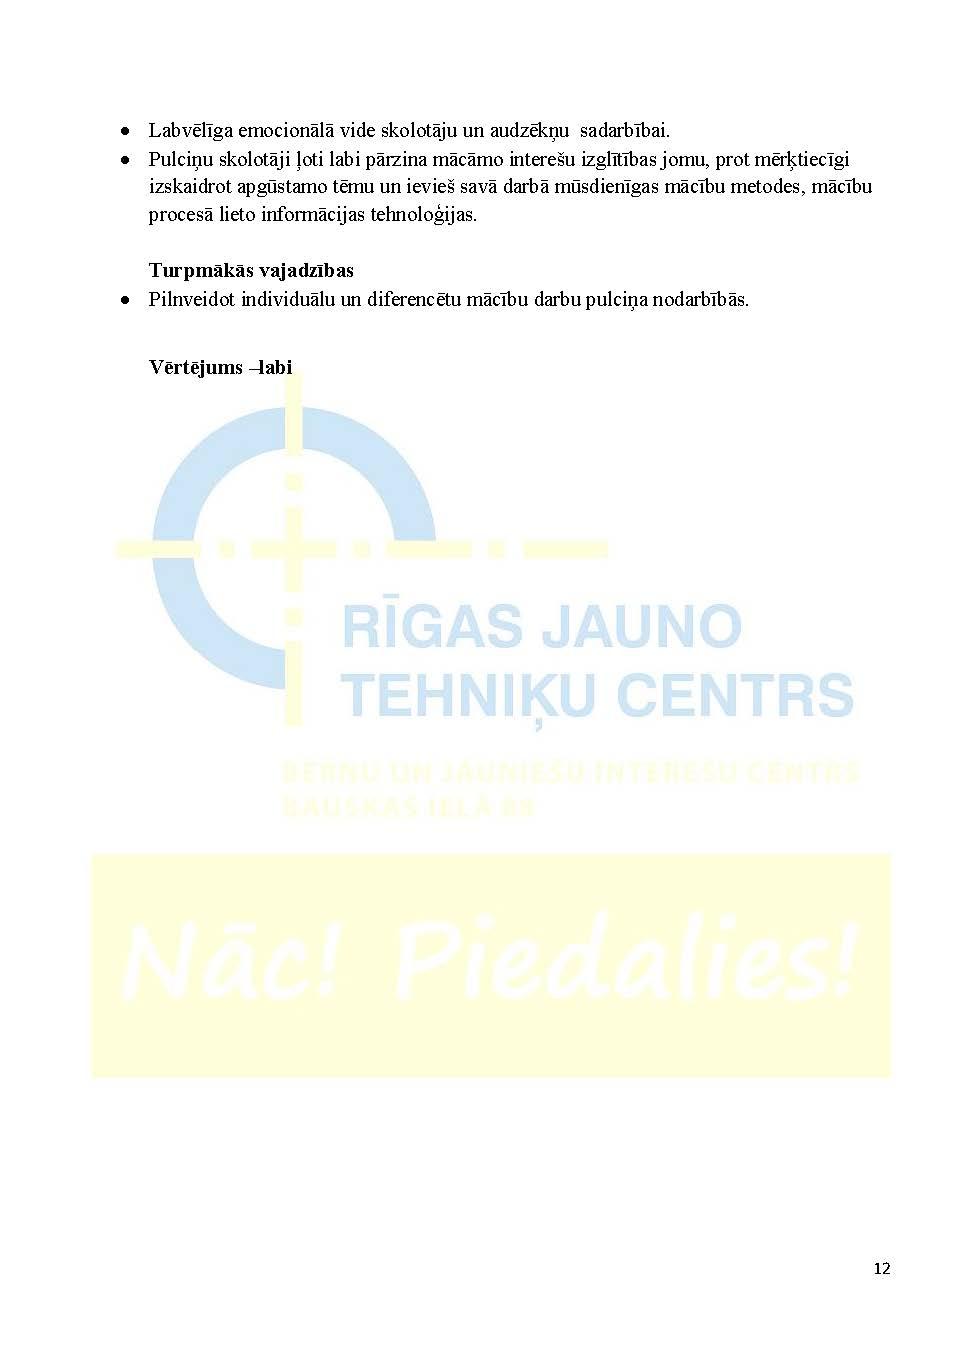 rjtc_2013-12